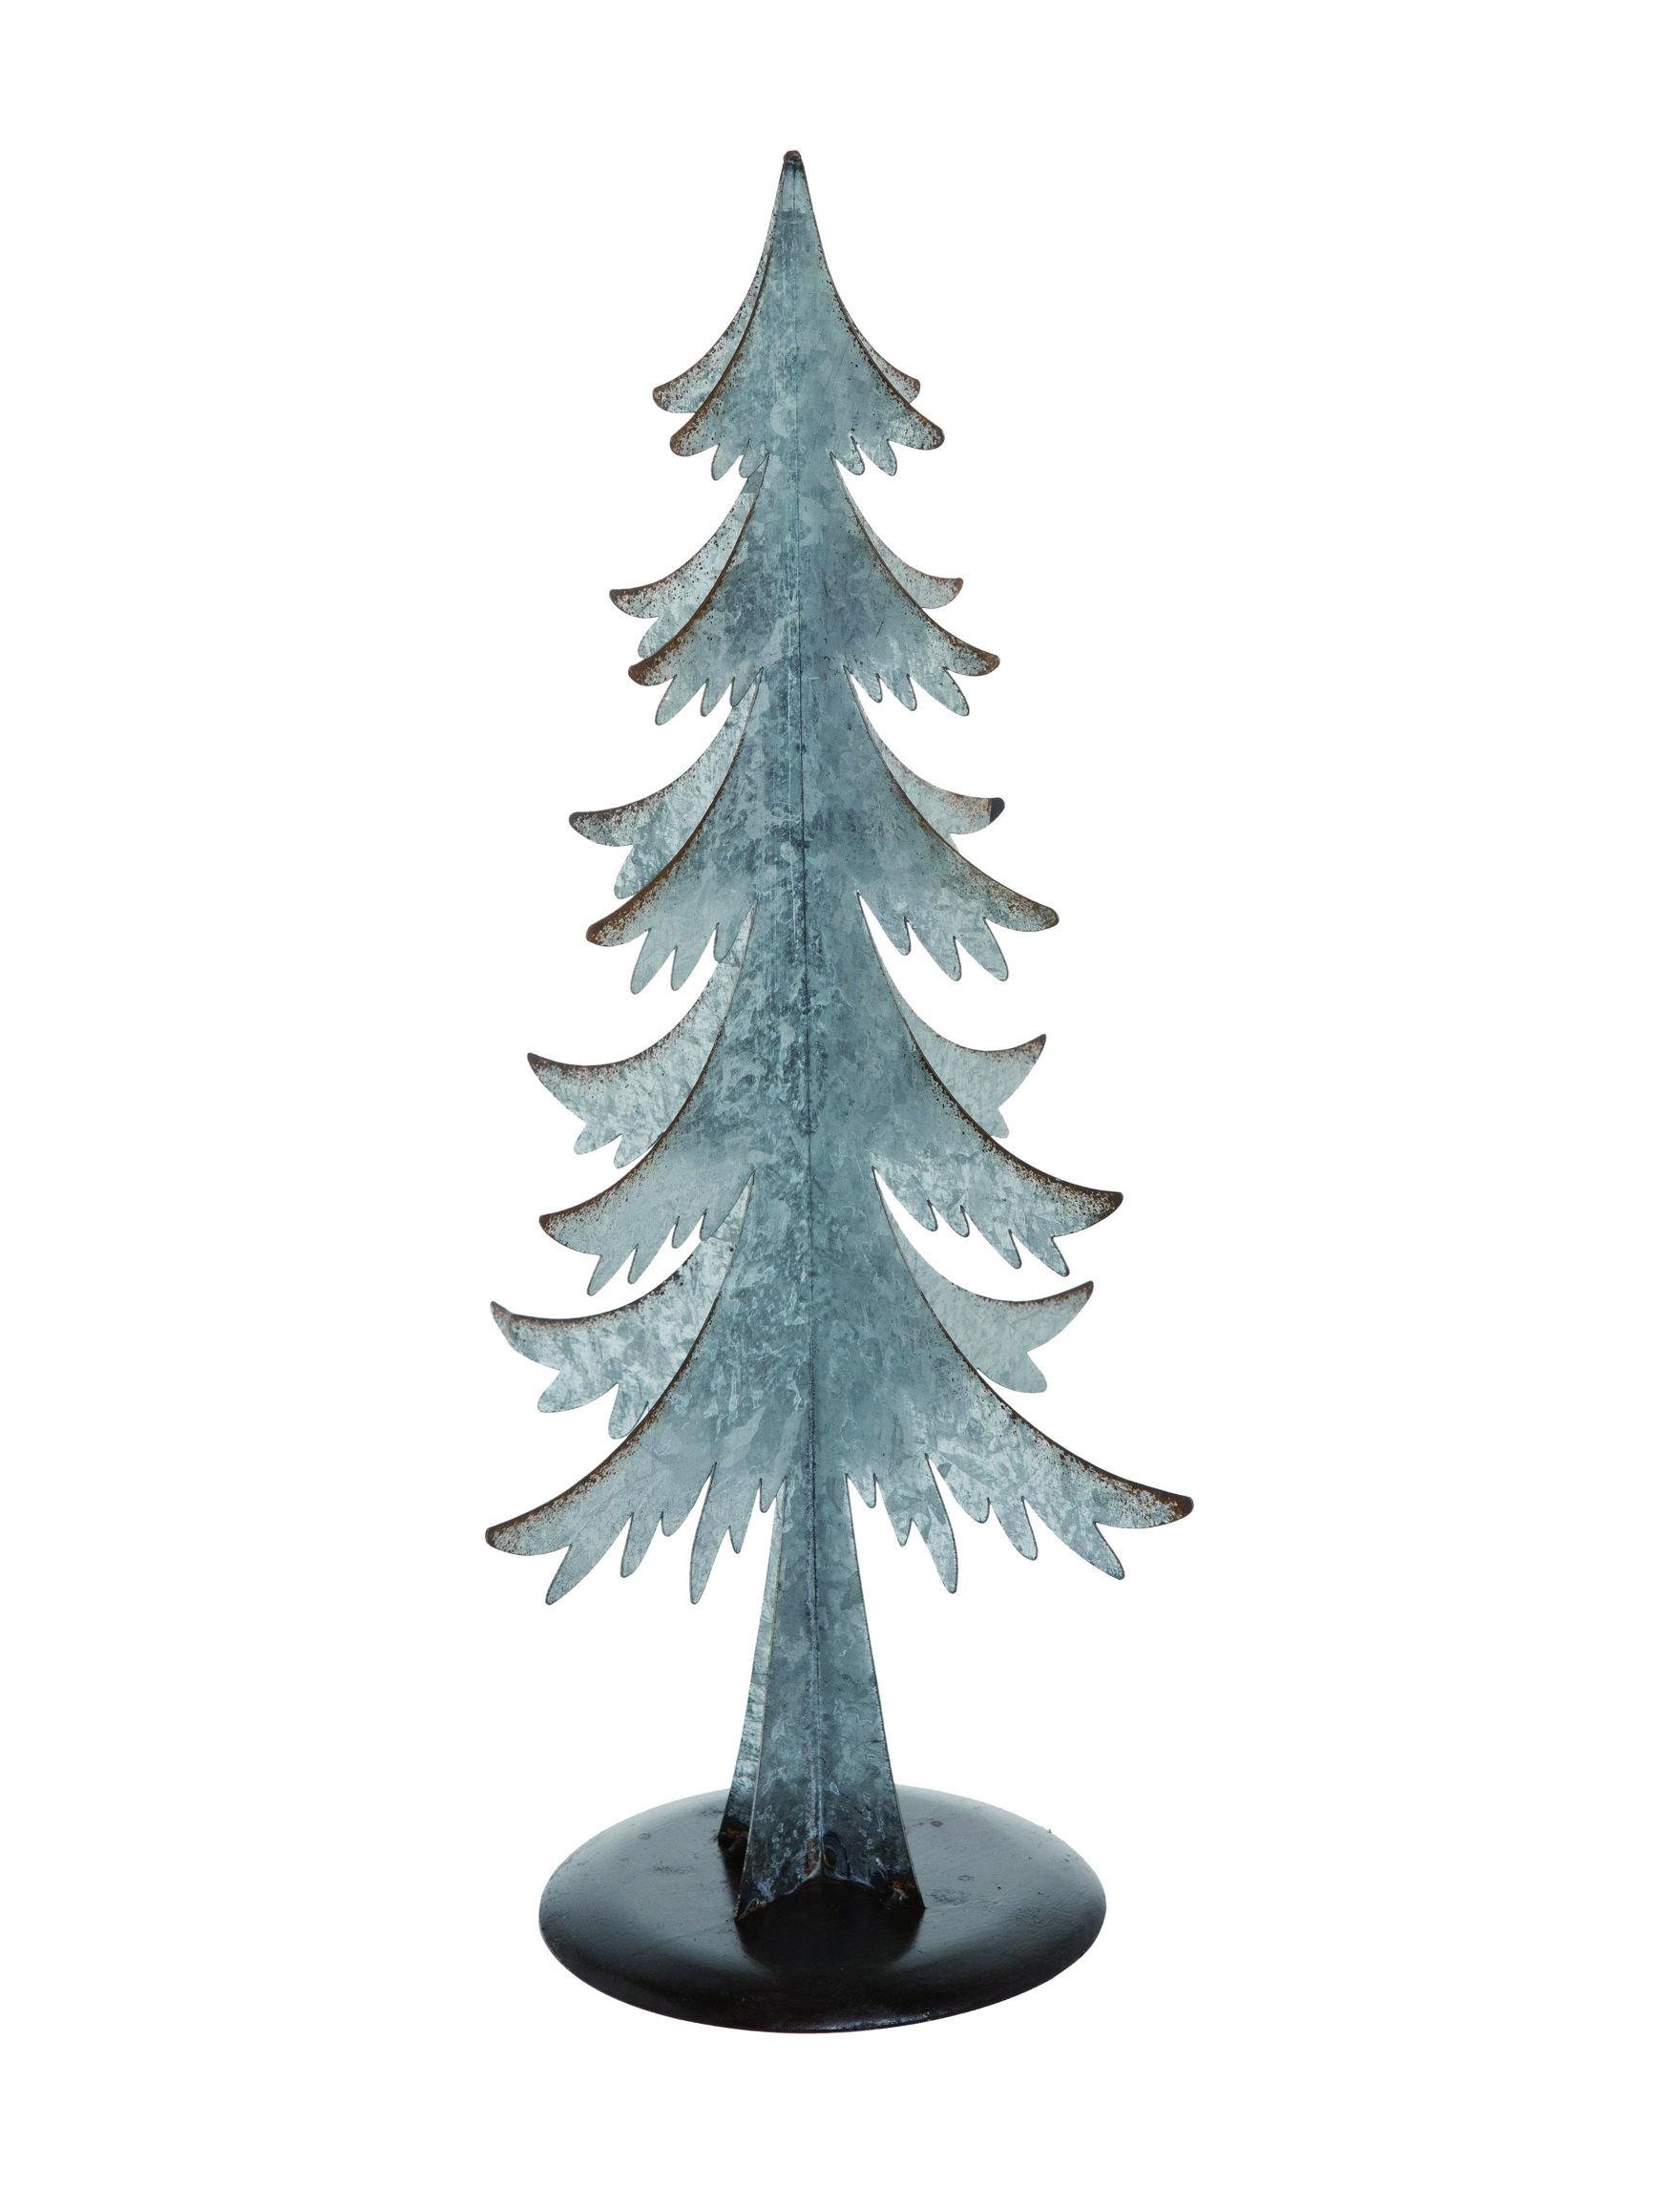 Transpac Galvanized Decorative Objects Holiday Decor